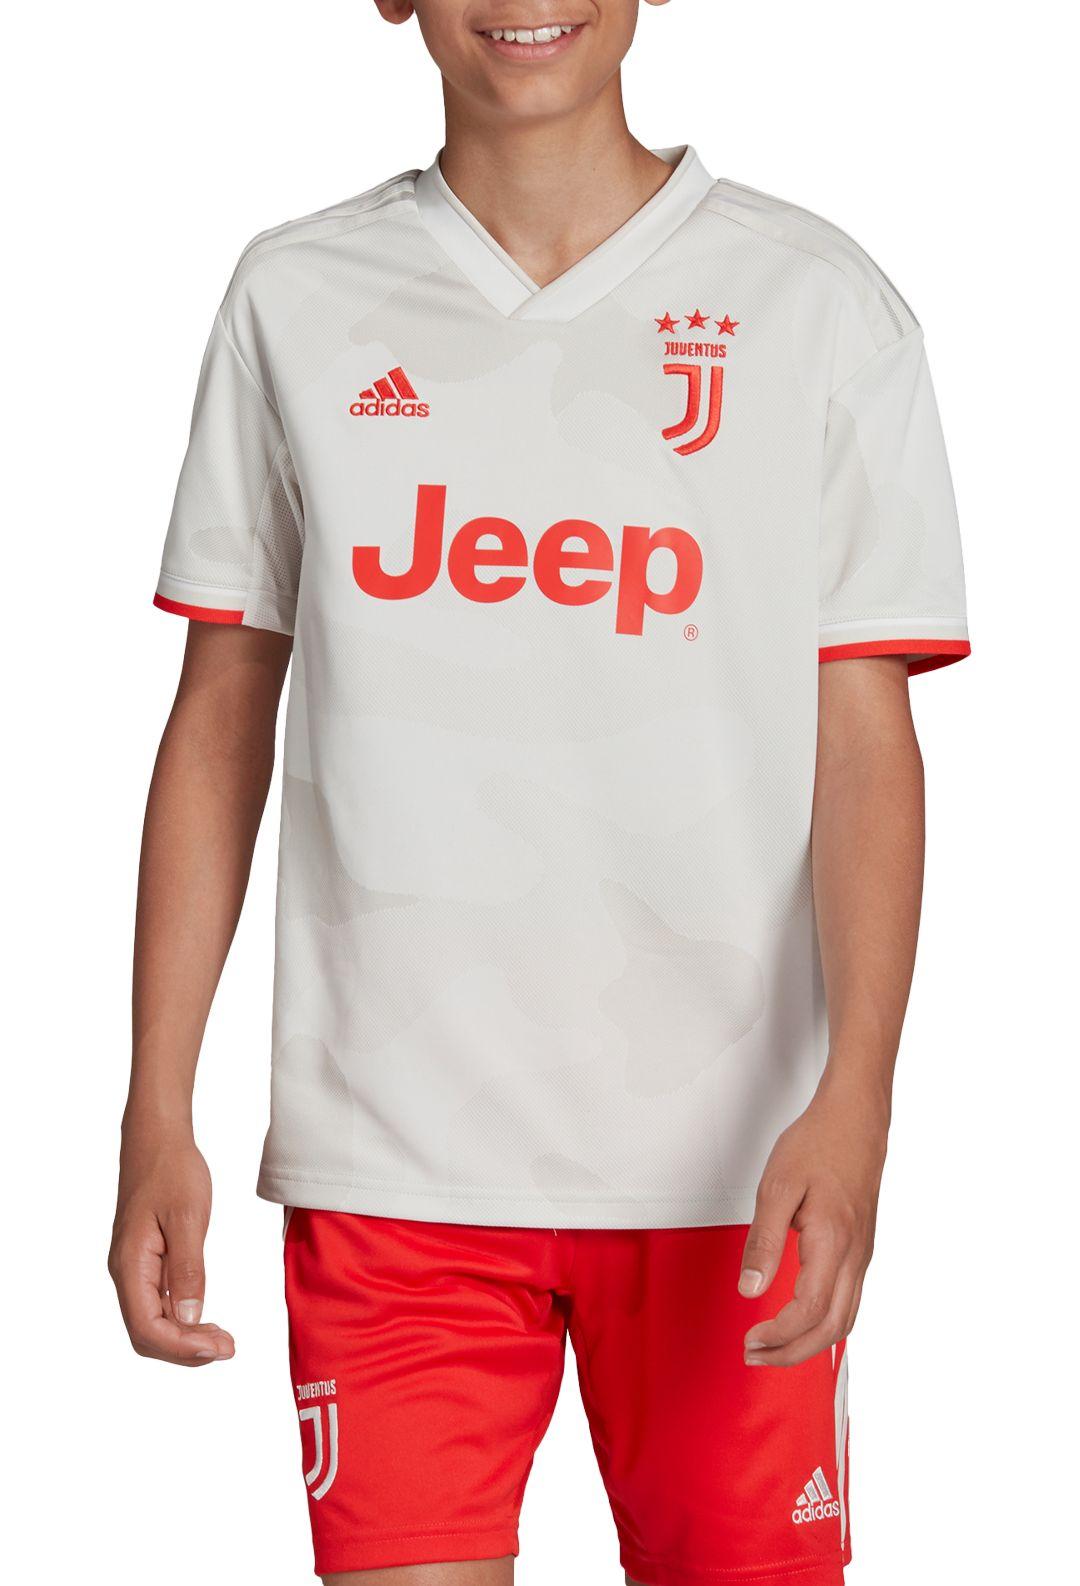 finest selection 76d11 53240 adidas Youth Juventus '19 Stadium Away Replica Jersey